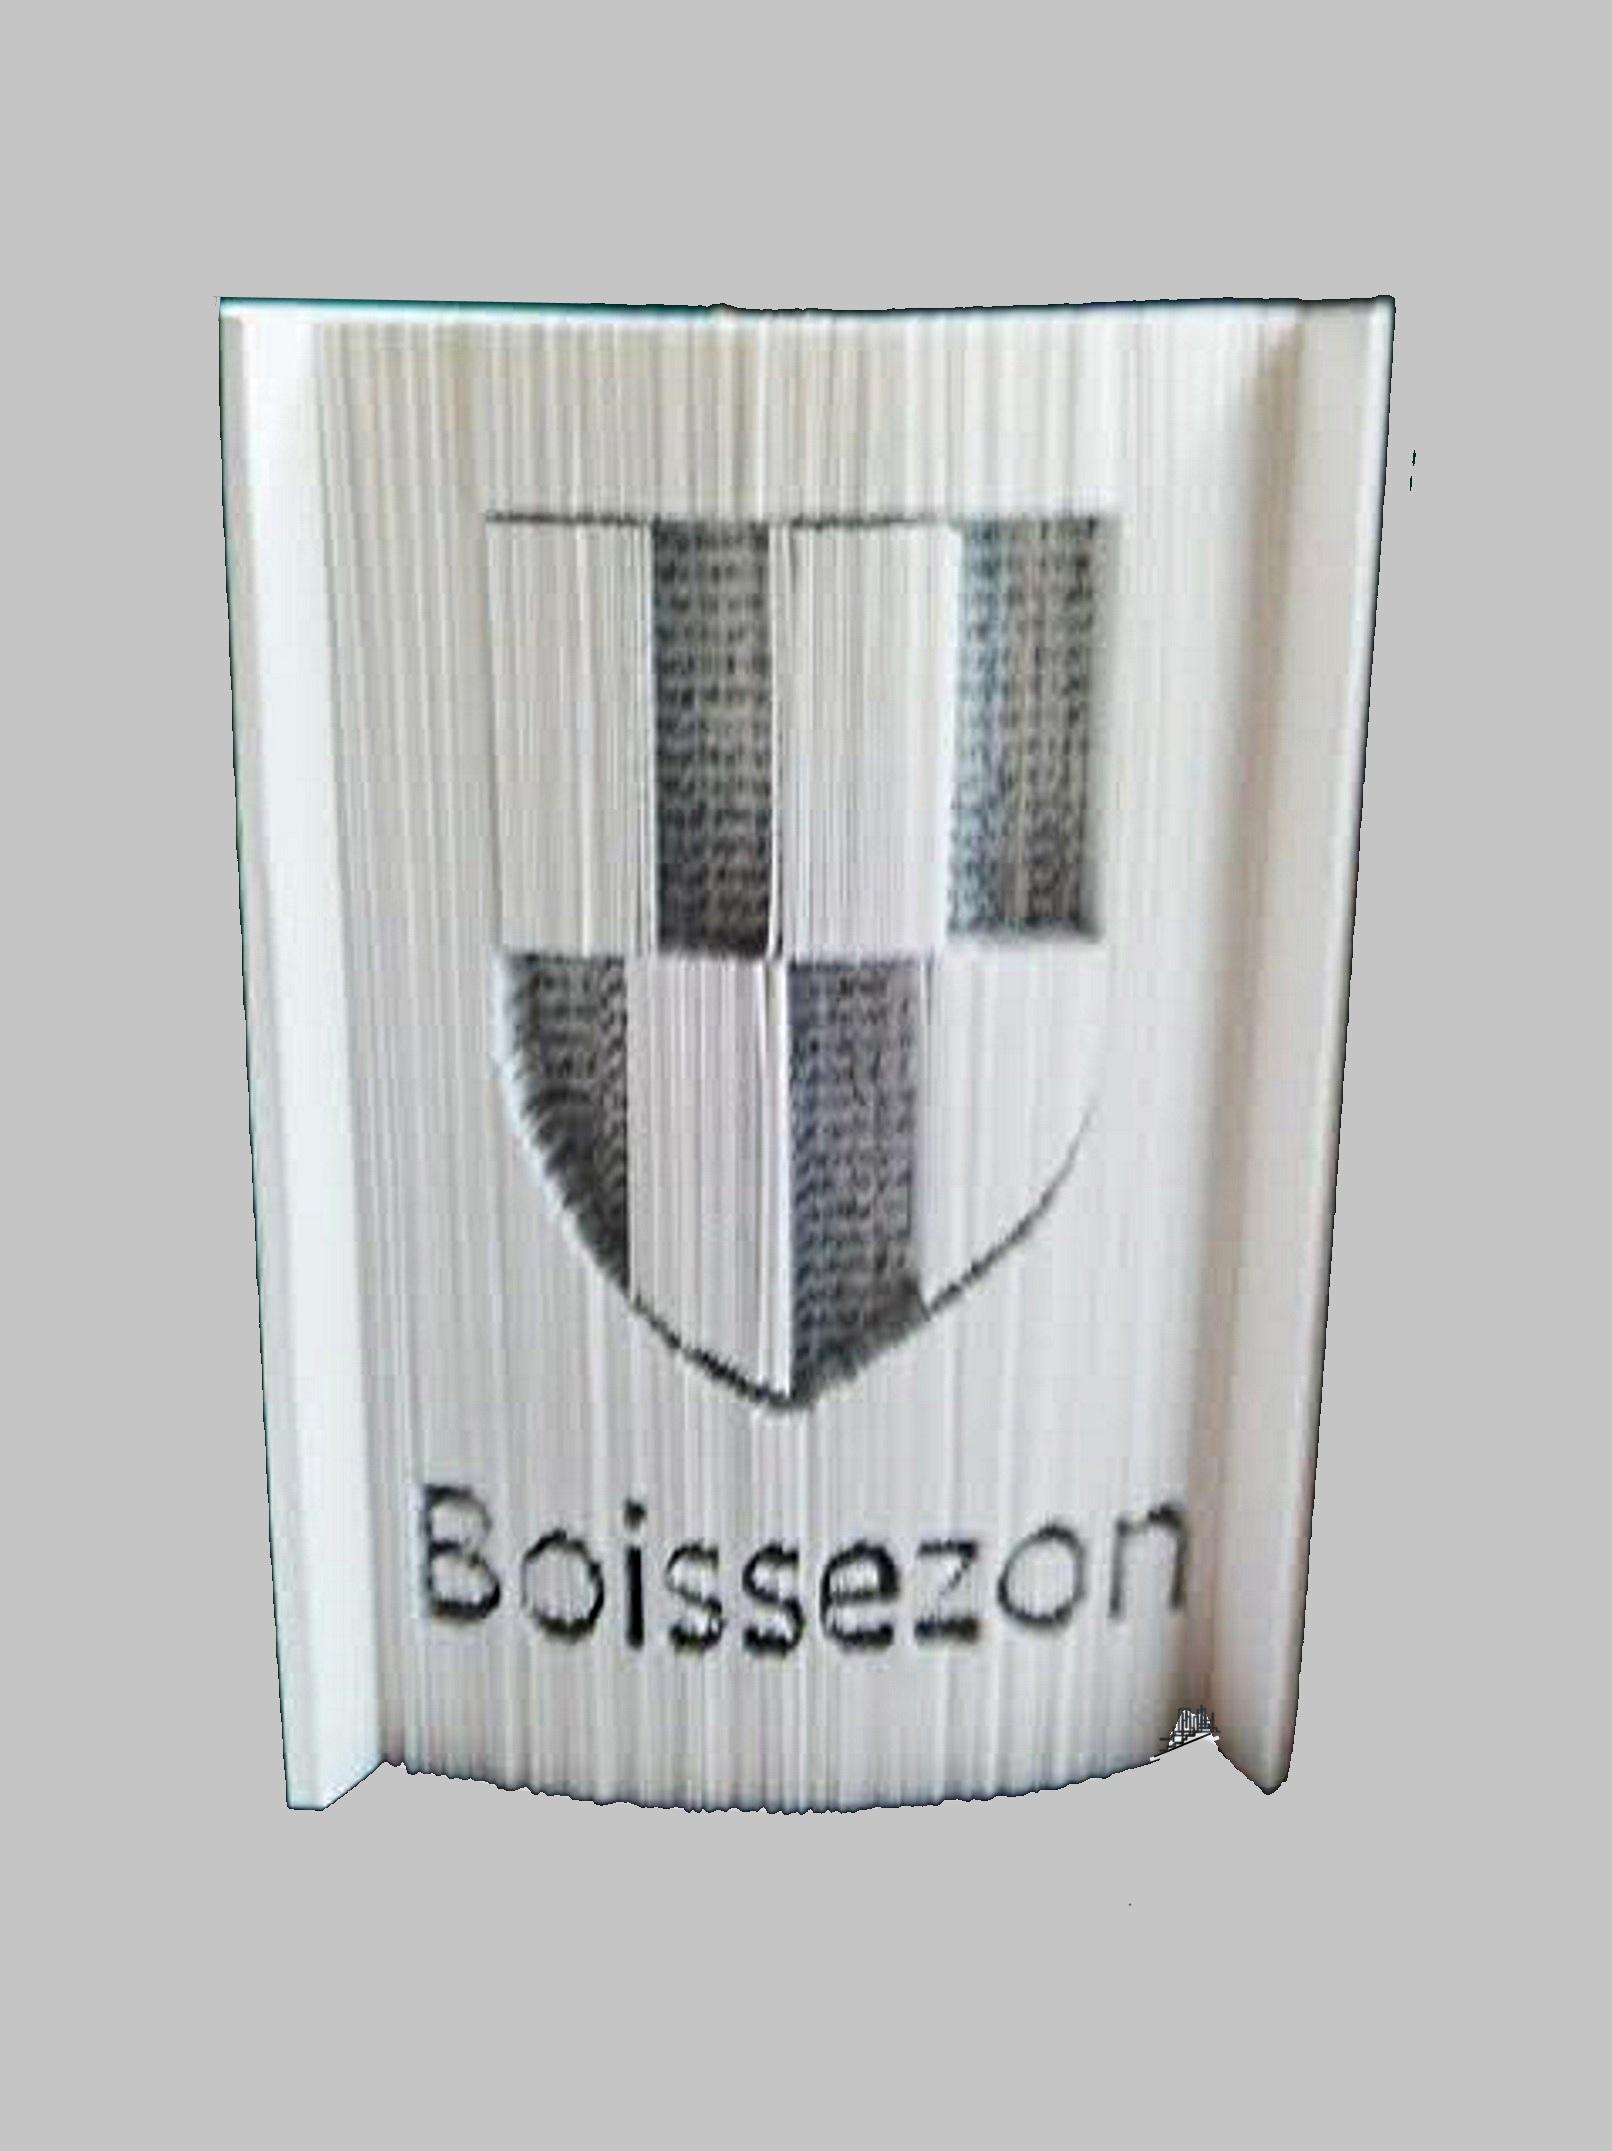 Blason Boissezon (81).jpg